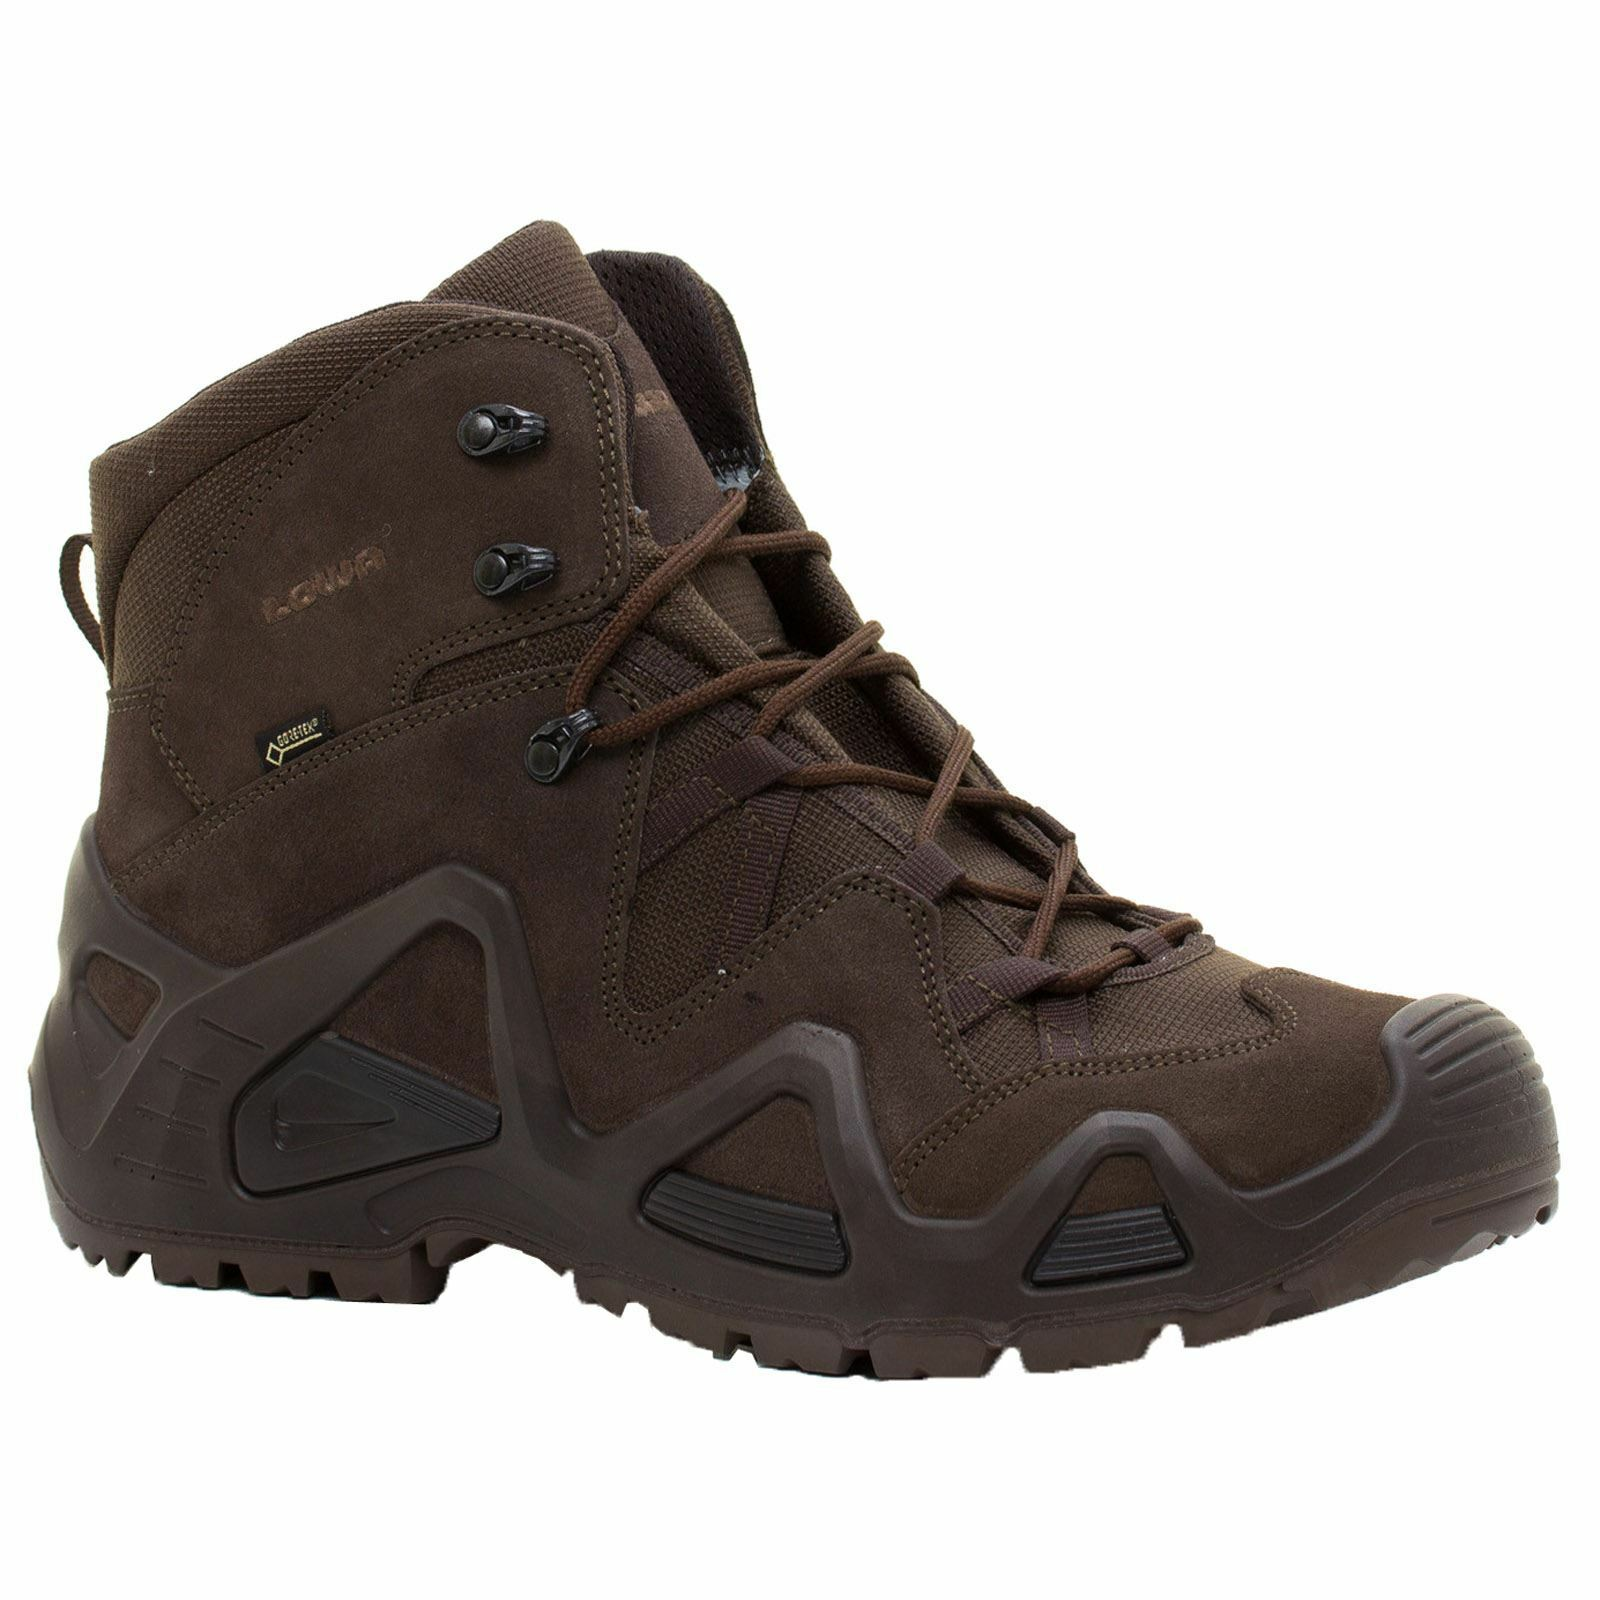 Lowa Zephyr Gore-Tex Mid Task Force Dark Brown Mens Suede Military Boots